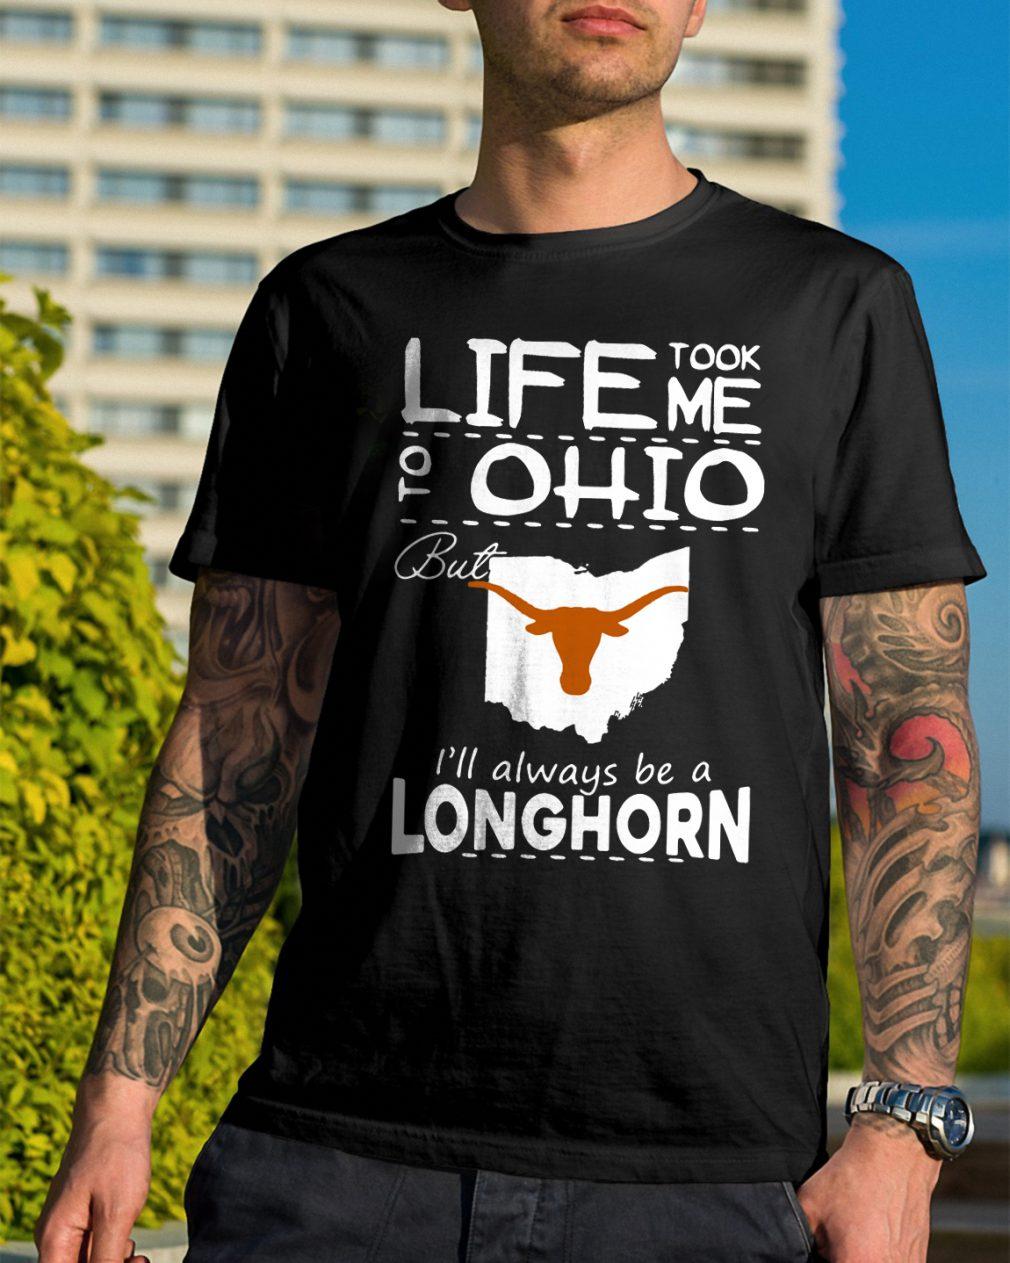 Life Took Ohio Ill Always Longhorn Shirt